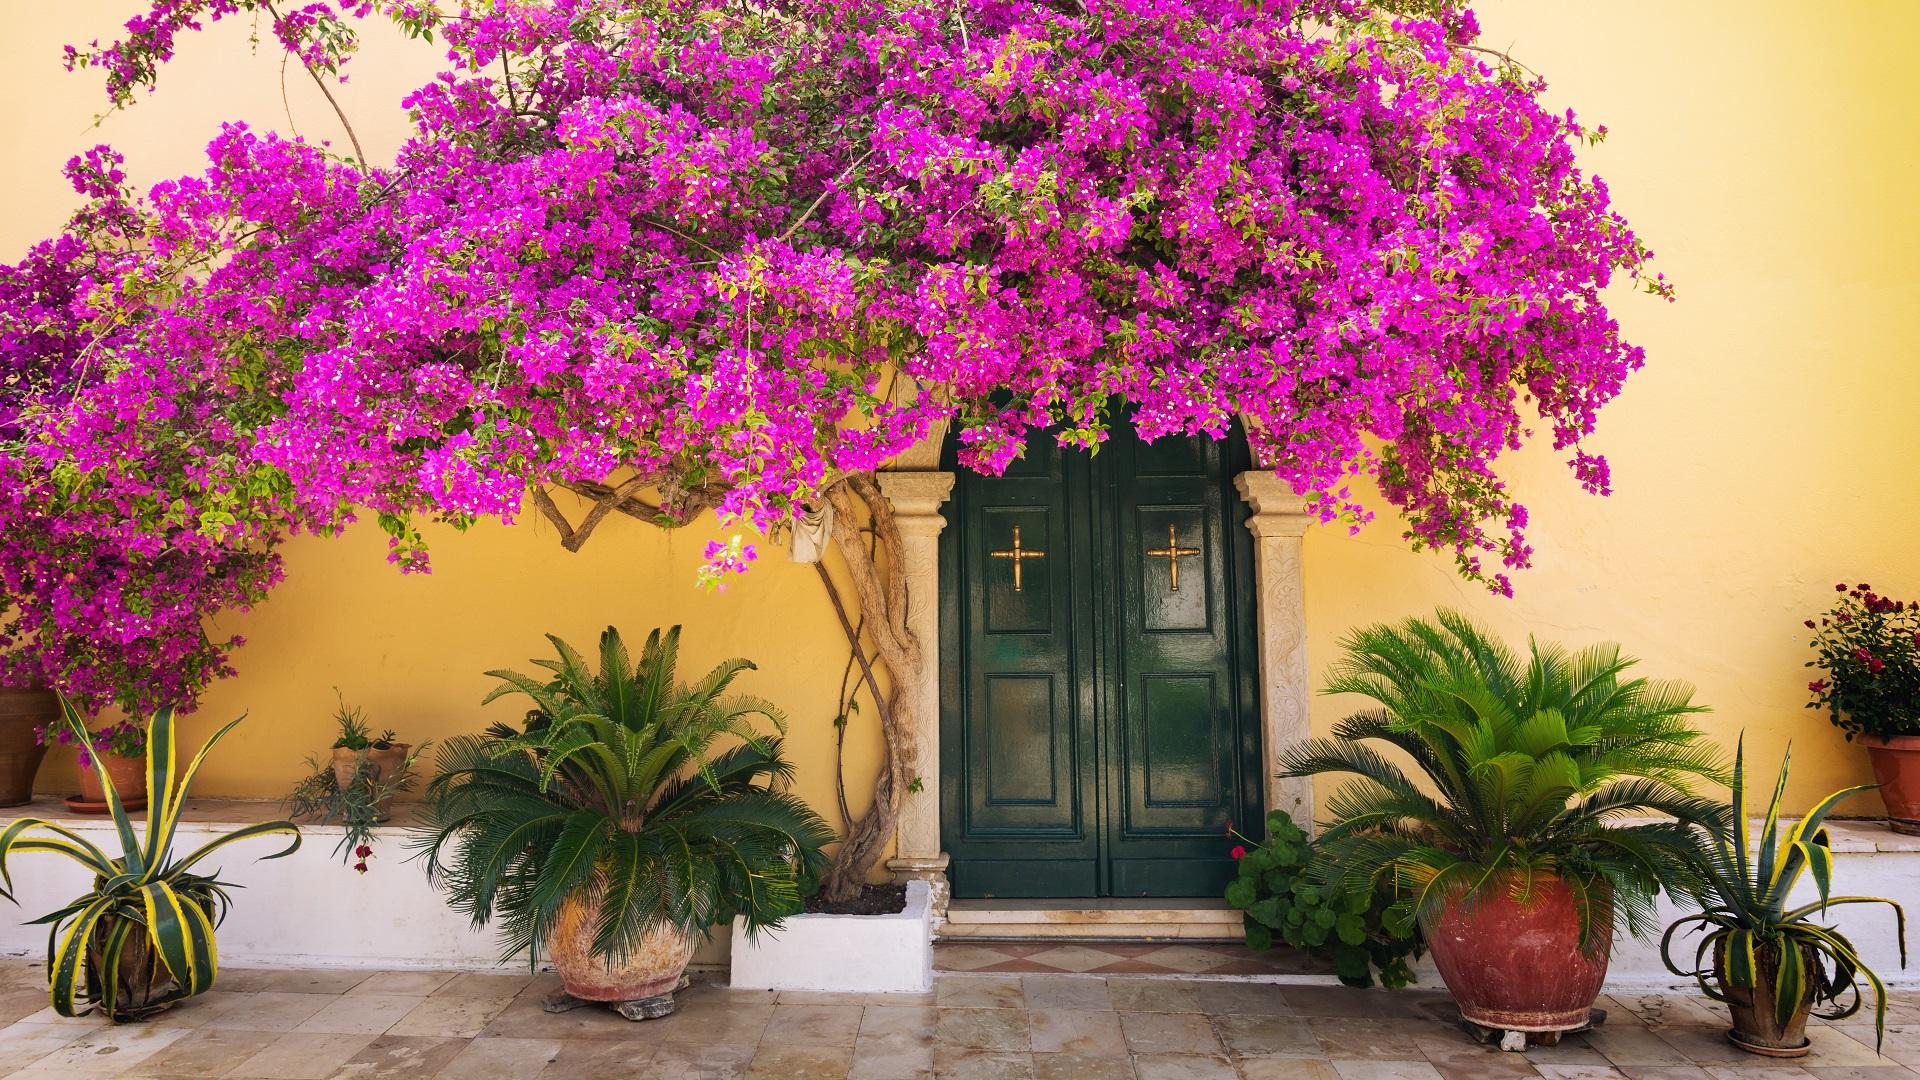 Een mooie deur met paarse bloemen in Corfu